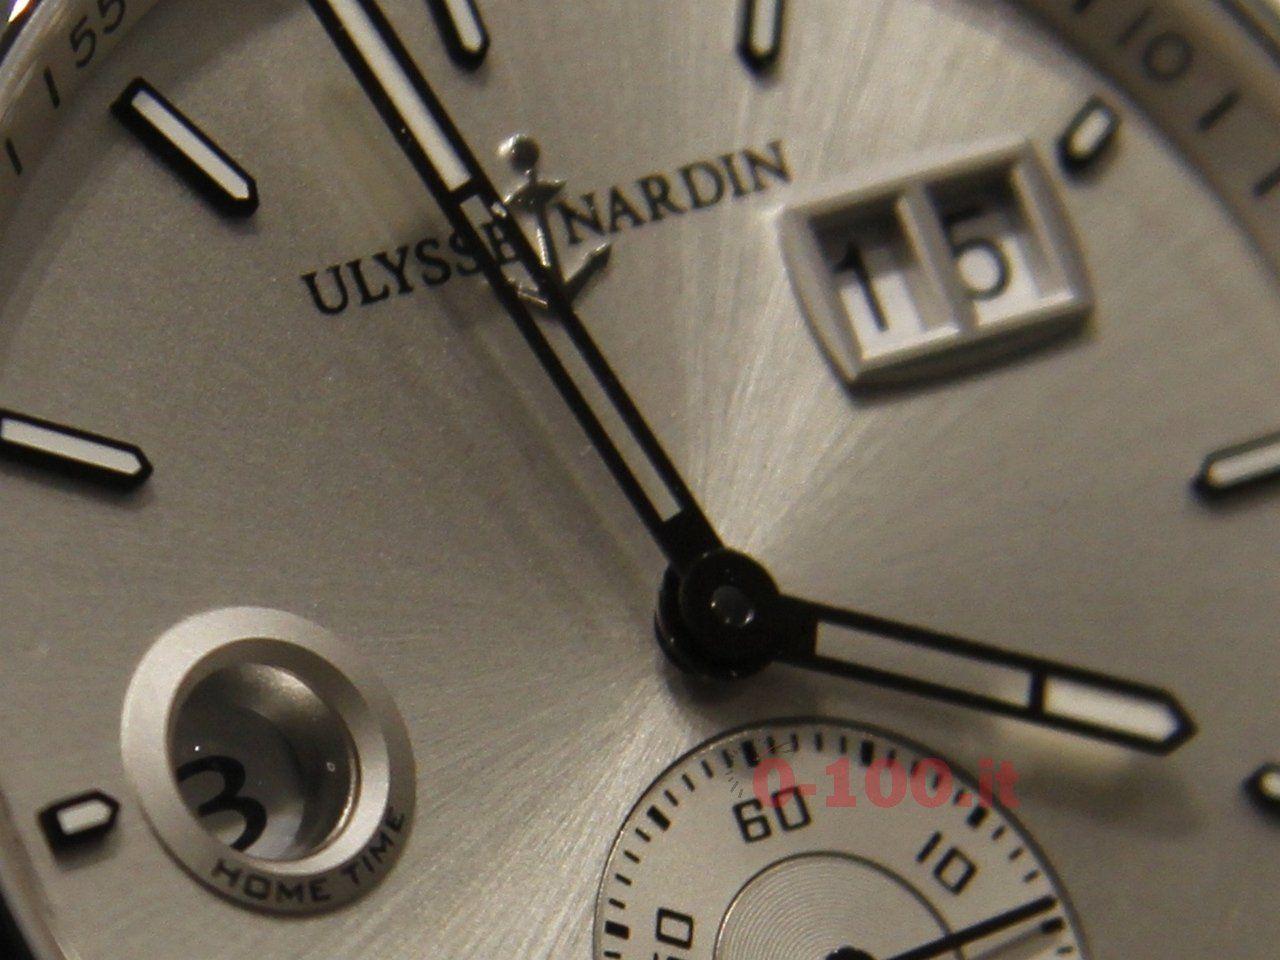 baselworld-2014-Ulysse Nardin Dual Time Manufacture_Ref_3346-126-91_0-1003